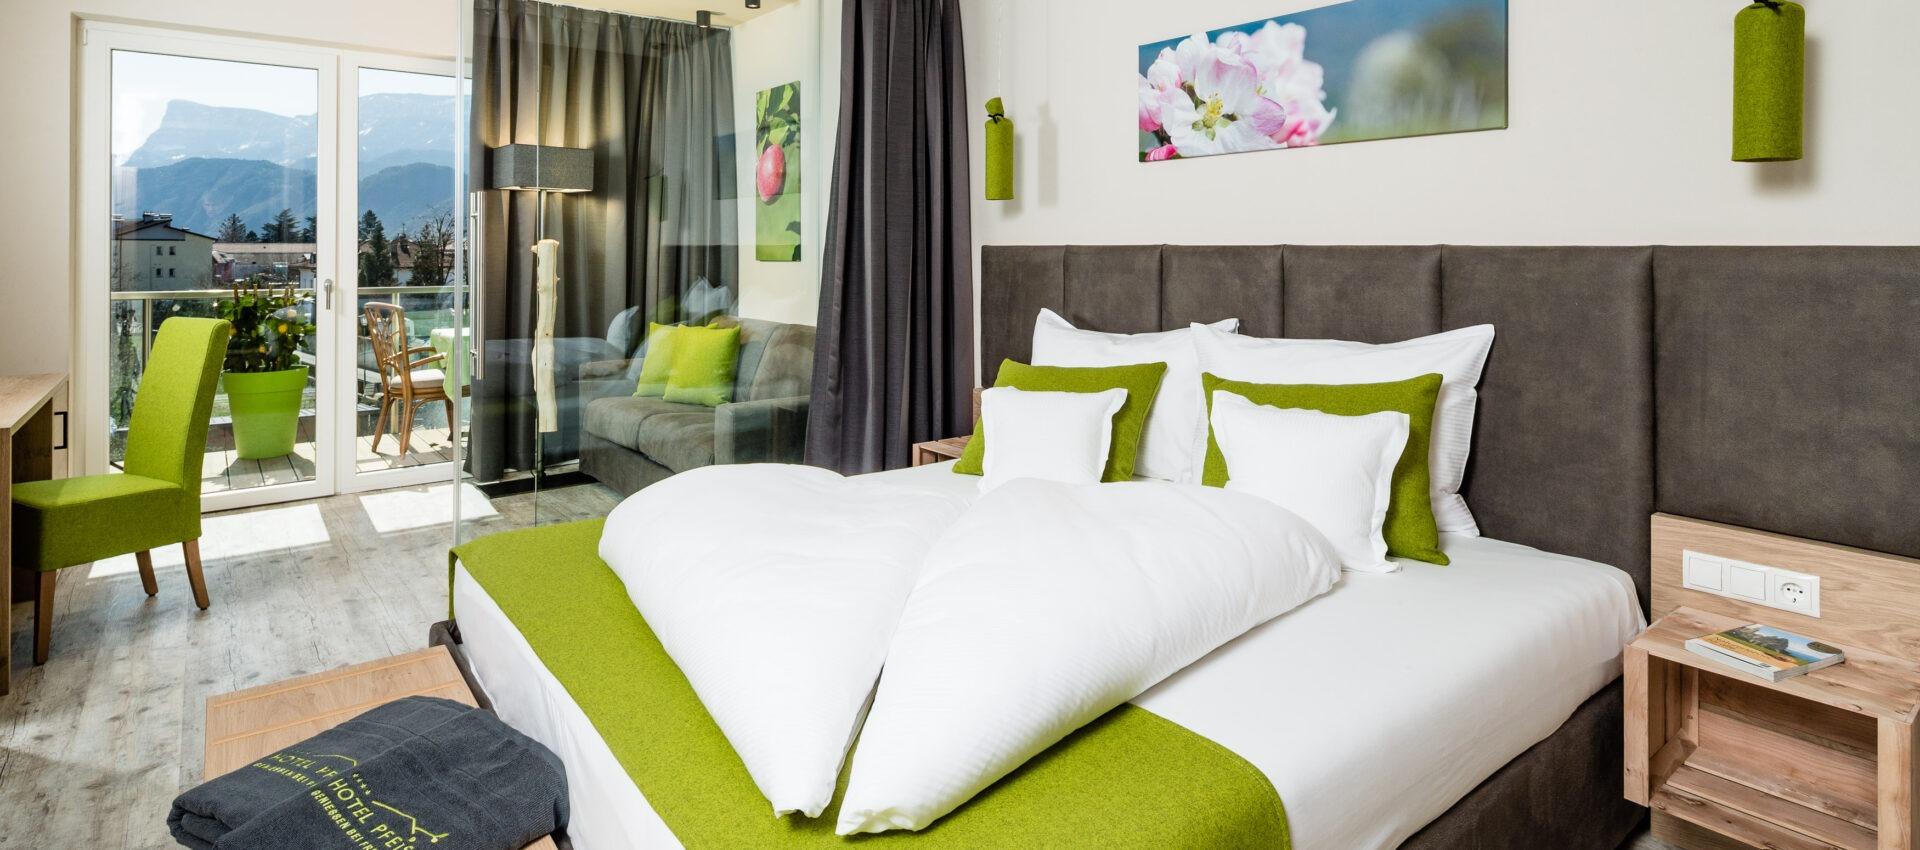 Zimmer Elstar 4 Sterne Hotel in Lana Pfeiss - Meran - Südtirol